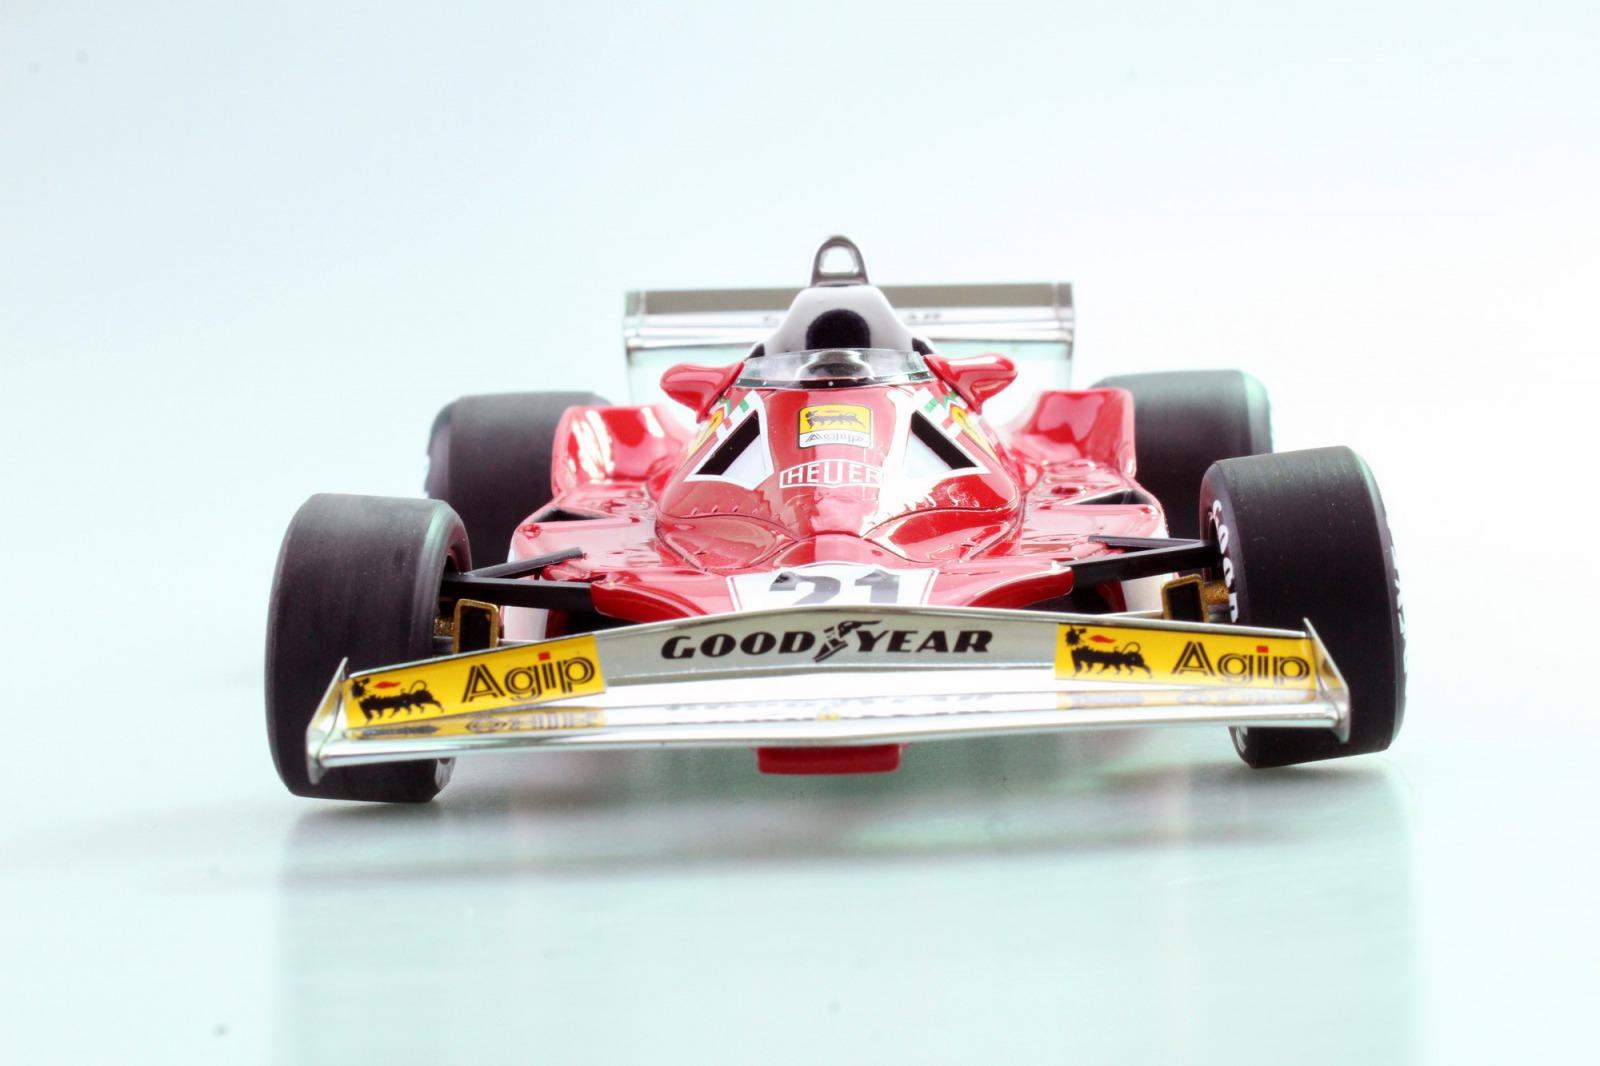 GP Repliacas 1:18スケール レジン・プロポーションモデル 1977年シーズン フェラーリ 312T2 No.21 ジル・ヴィルヌーブFERRARI - F1 312T2 N 21 SEASON 1977 G.VILLENEUVE 1/18 by GP Replacas NEW